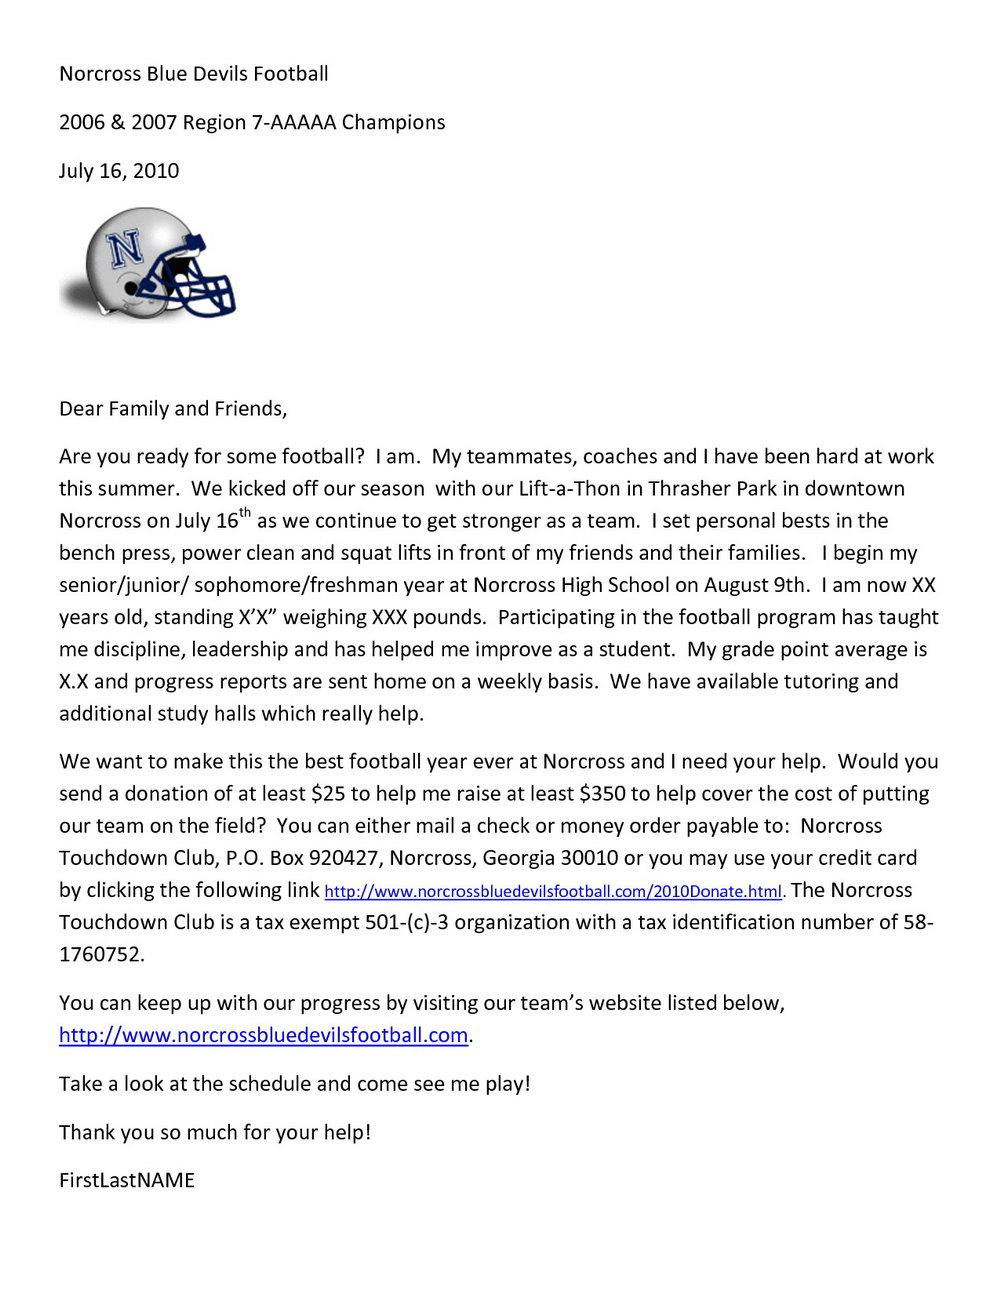 Fundraiser Donation Request Letter Template